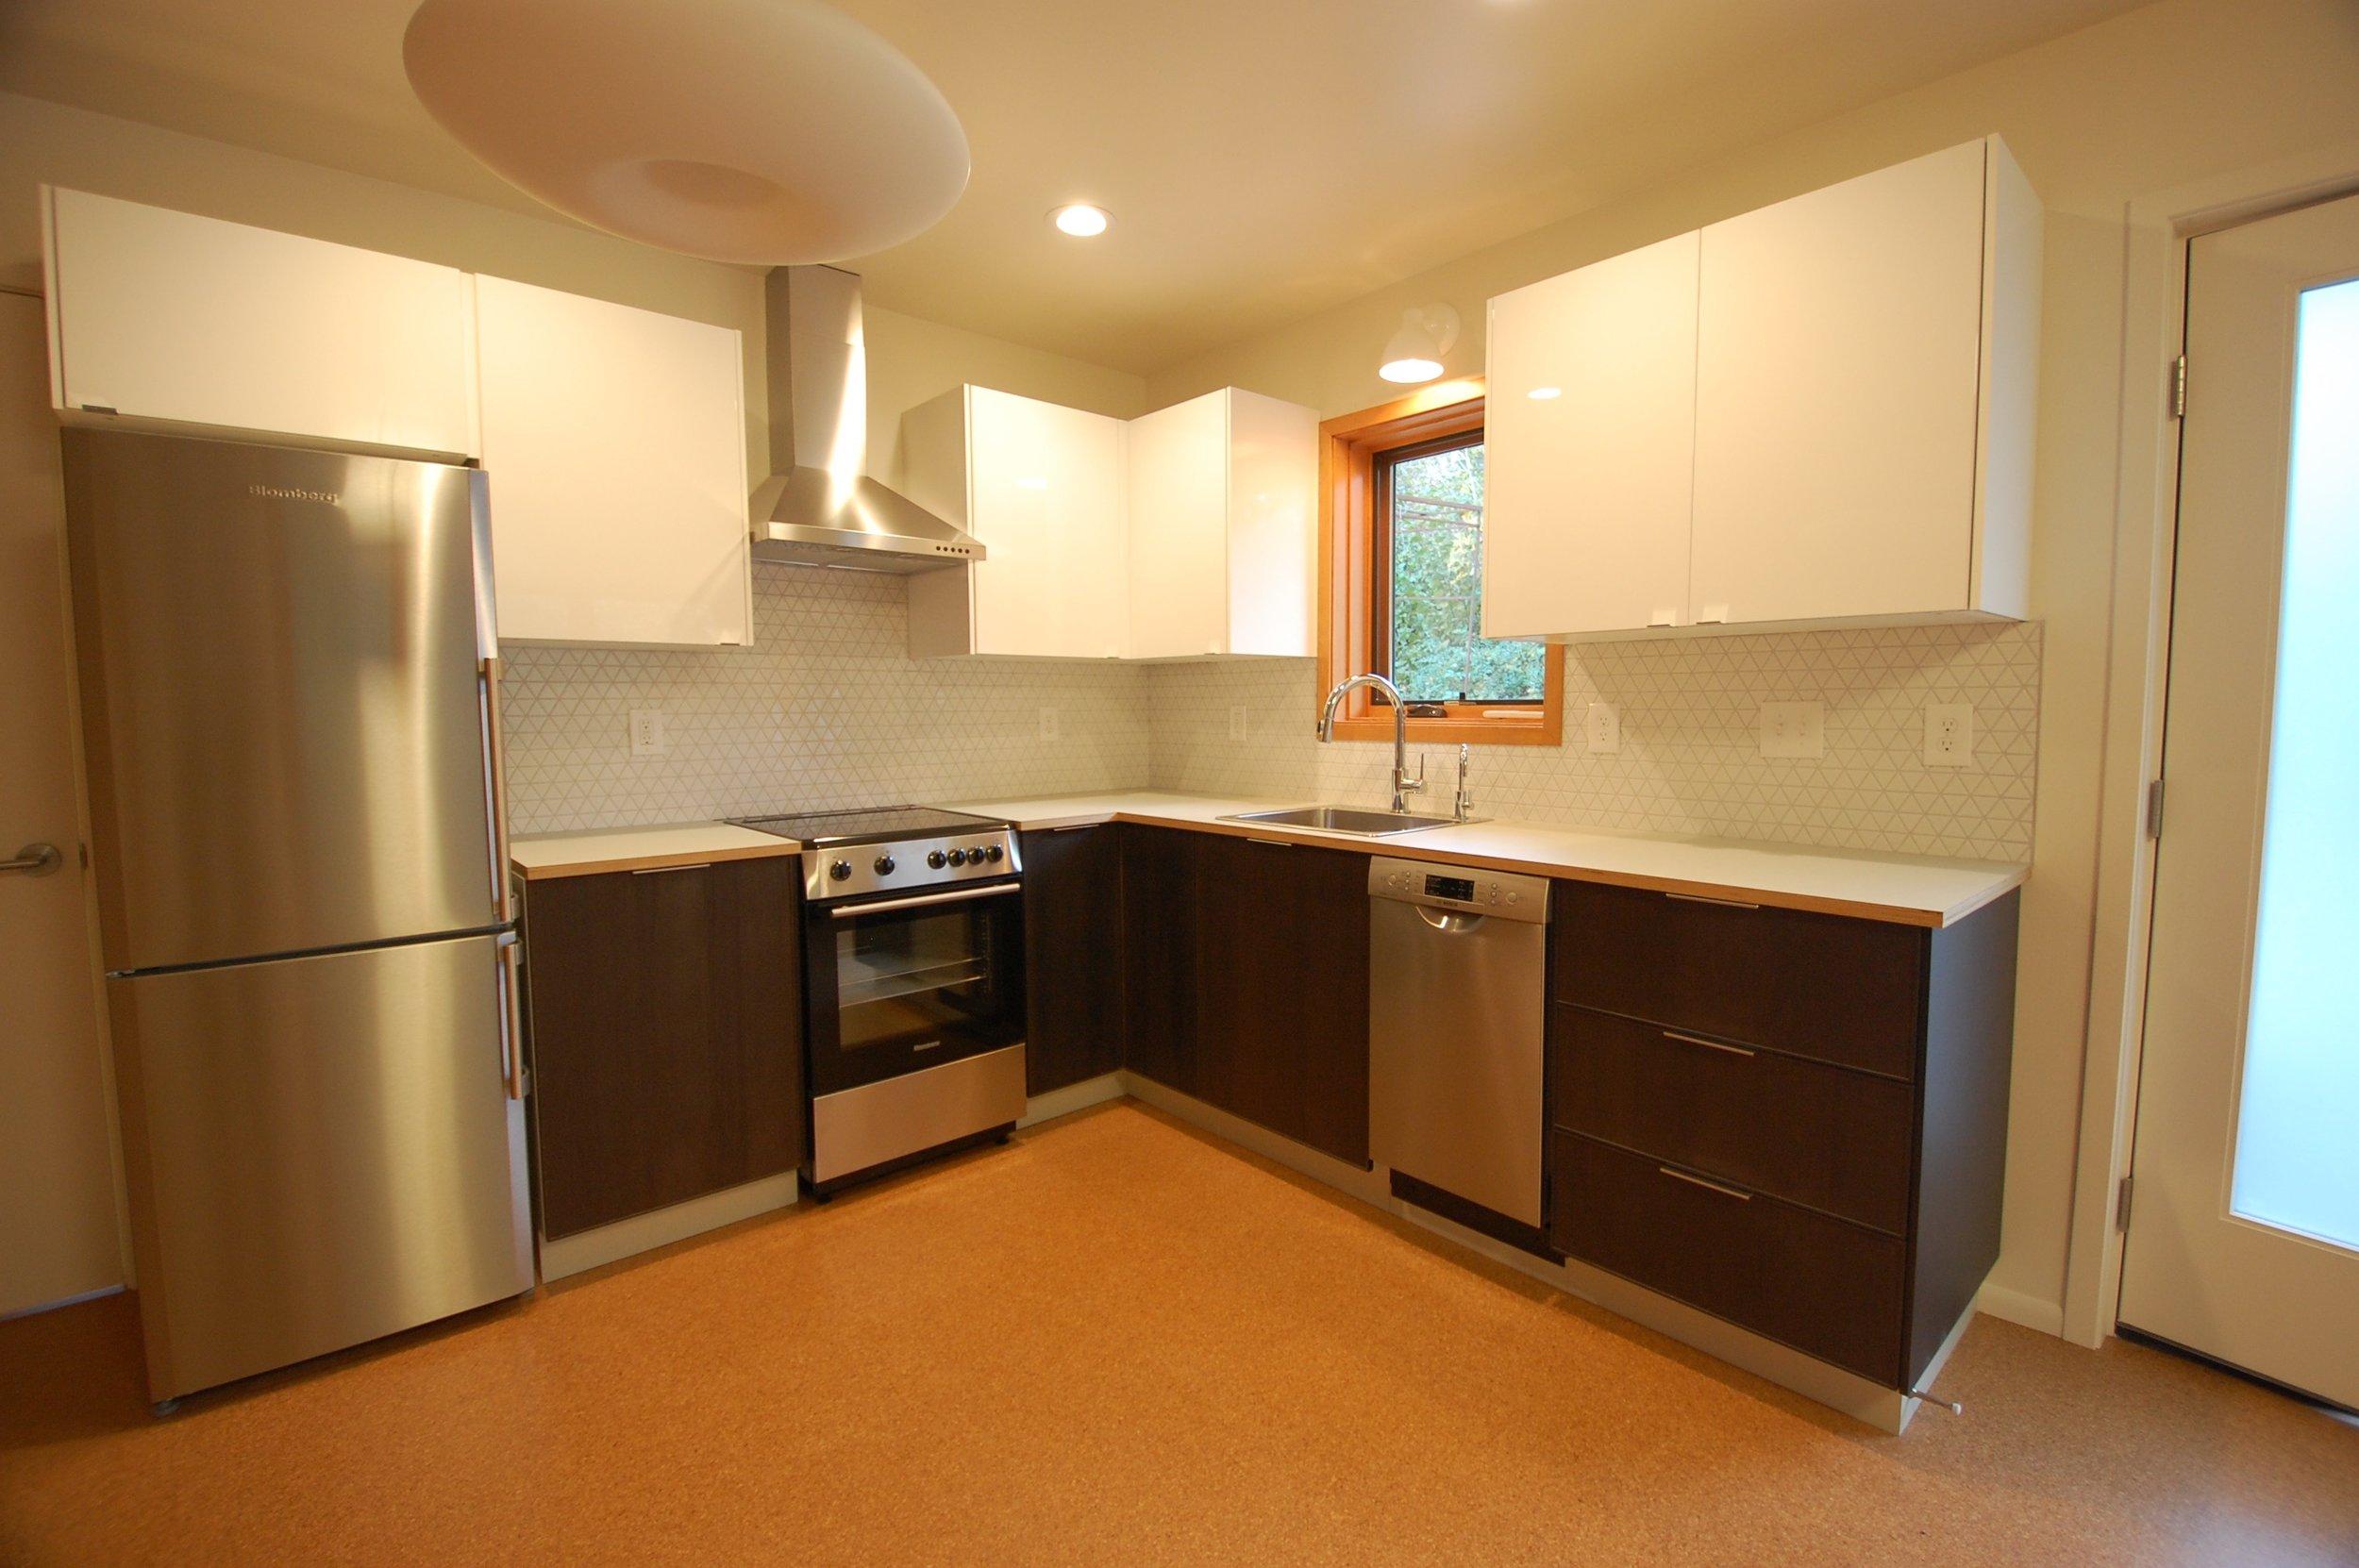 Smith_Hayes_Brothers_Construction_ADU_Basement_Kitchen_2b.jpg